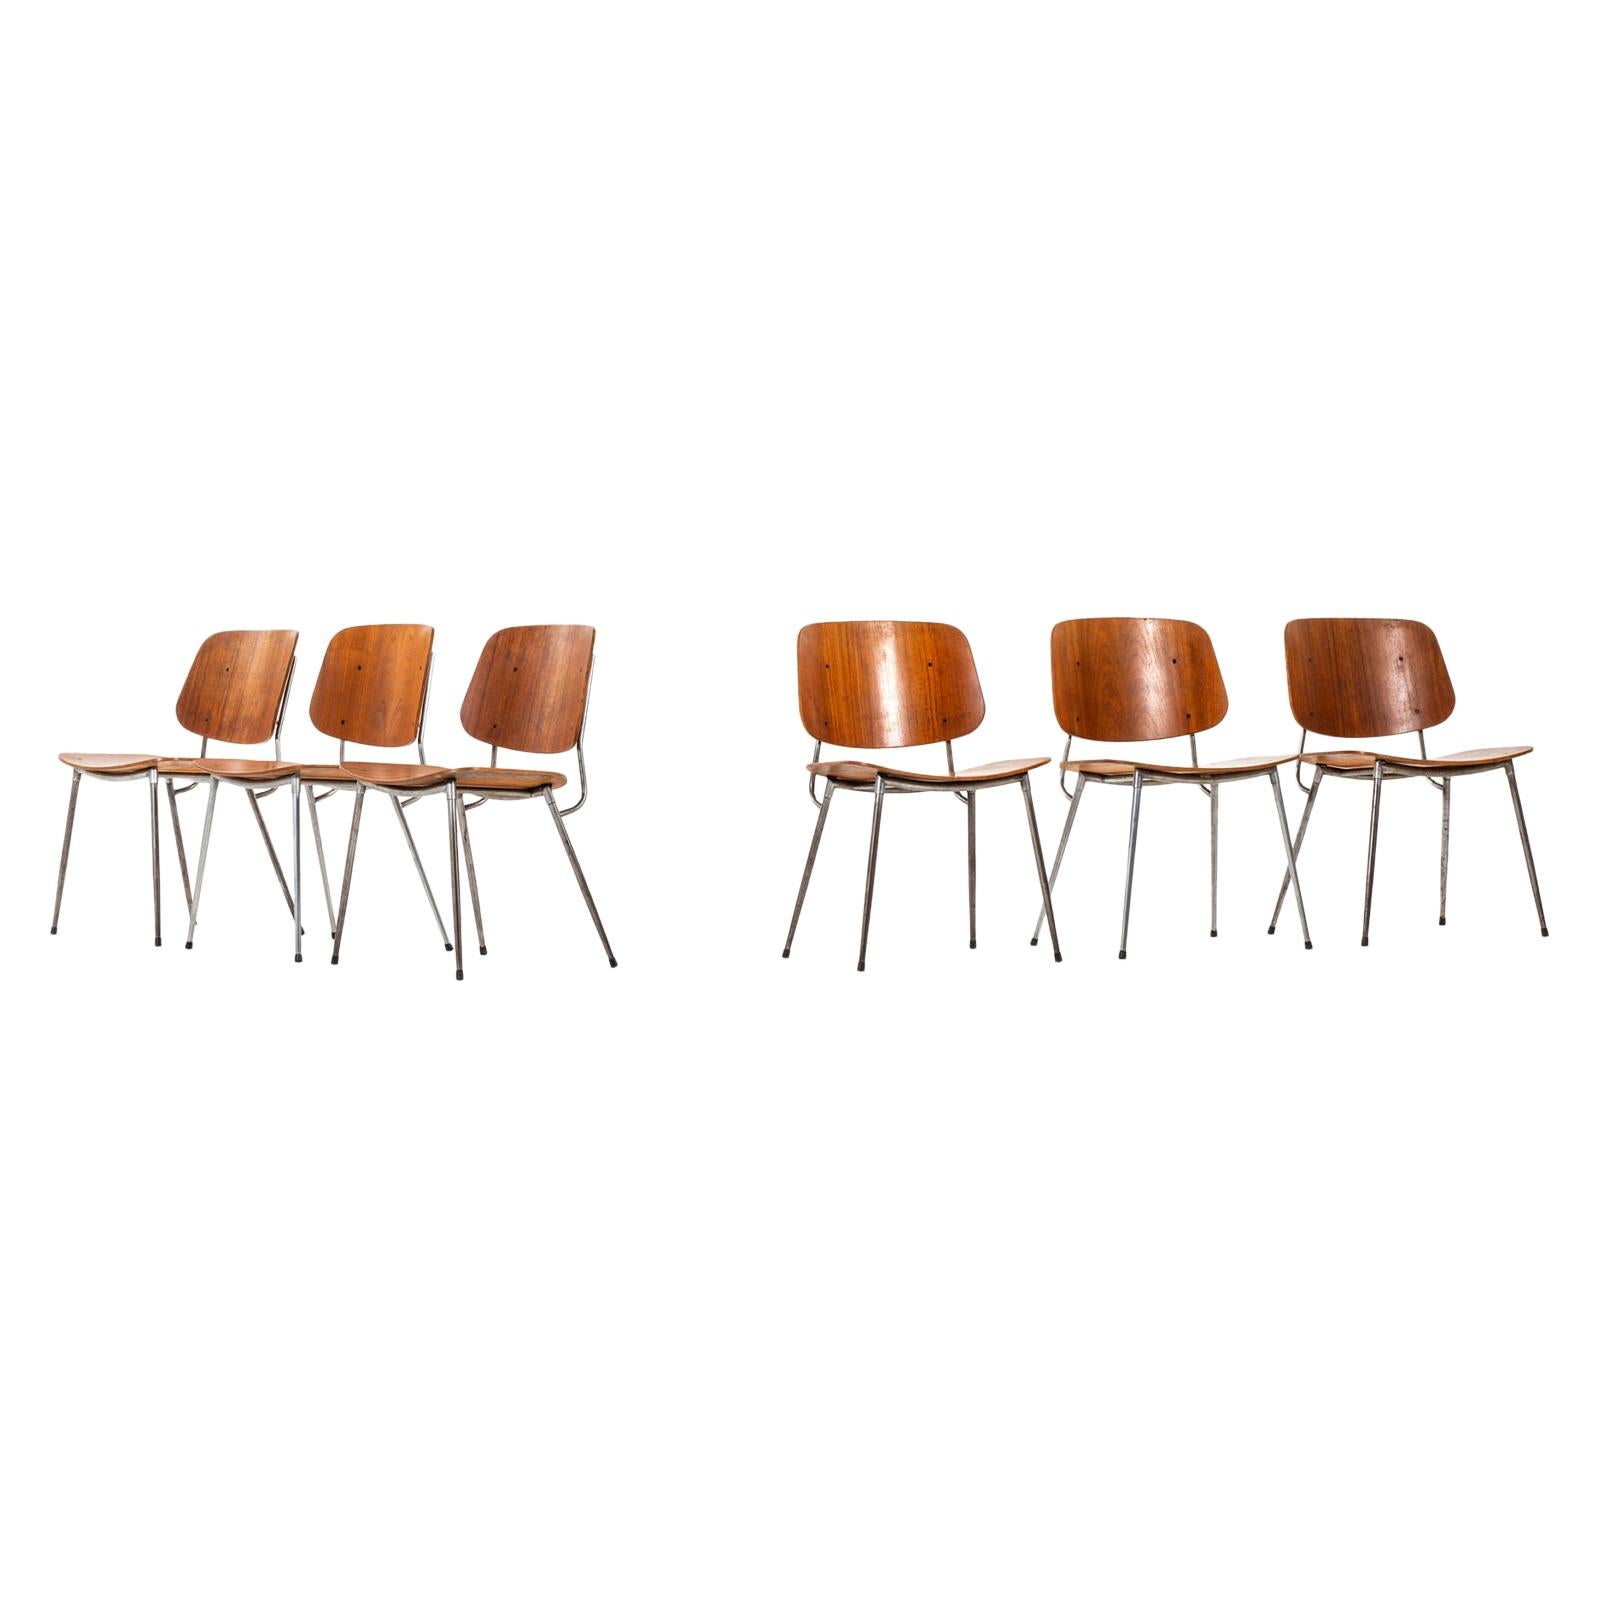 Børge Mogensen Dining Chairs Produced by Søborg Møbler in Denmark